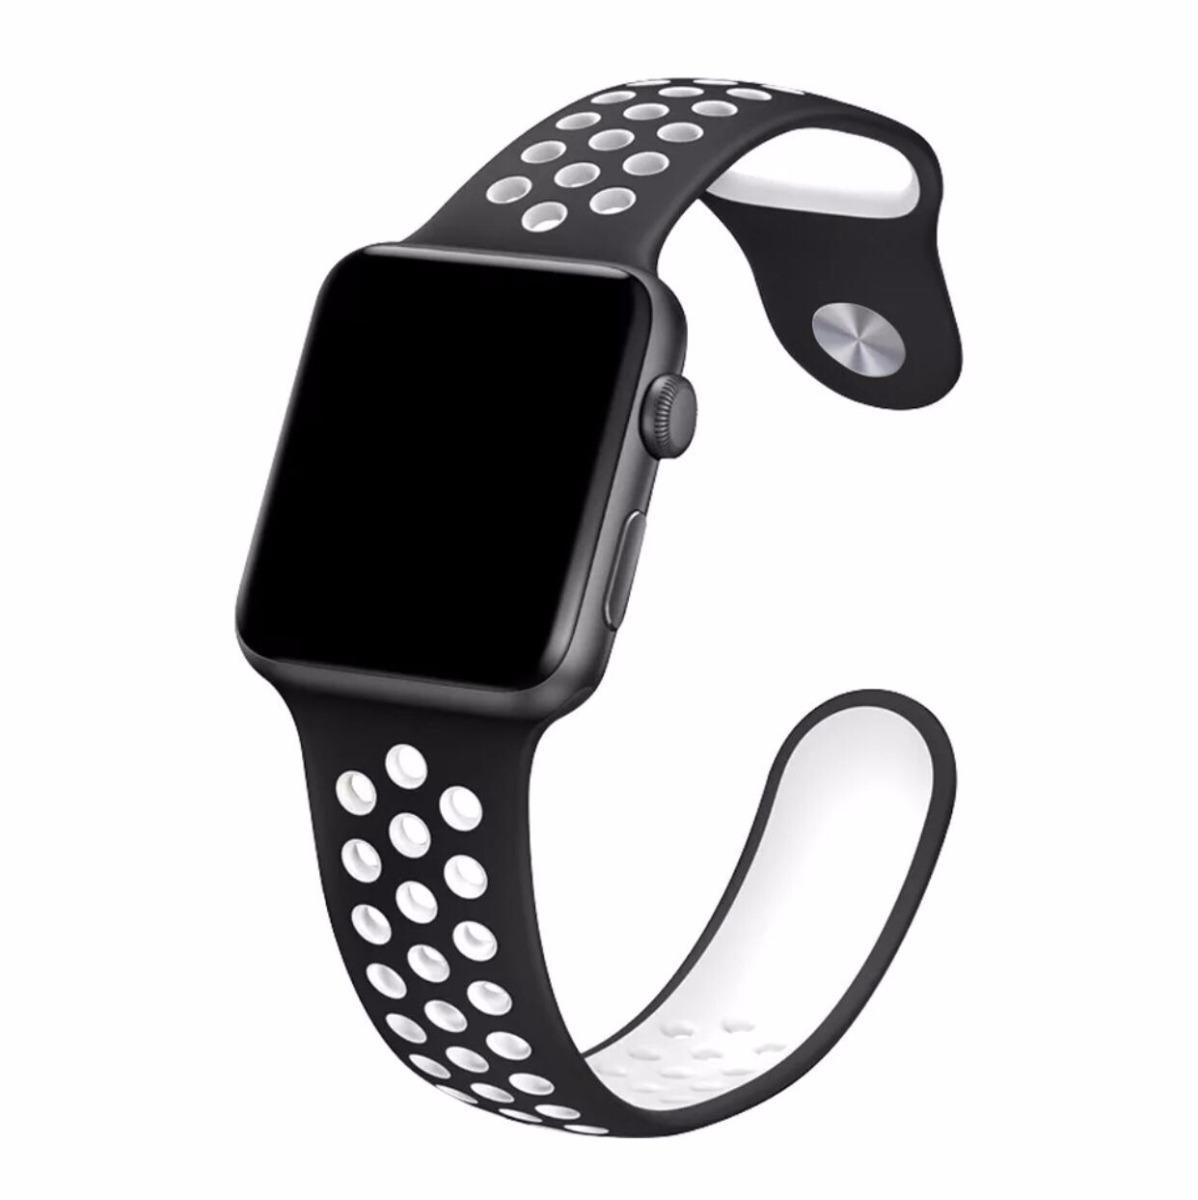 d79650f0762 pulseira apple watch nike38 40 42 44mm sporte series iwatch. Carregando  zoom.